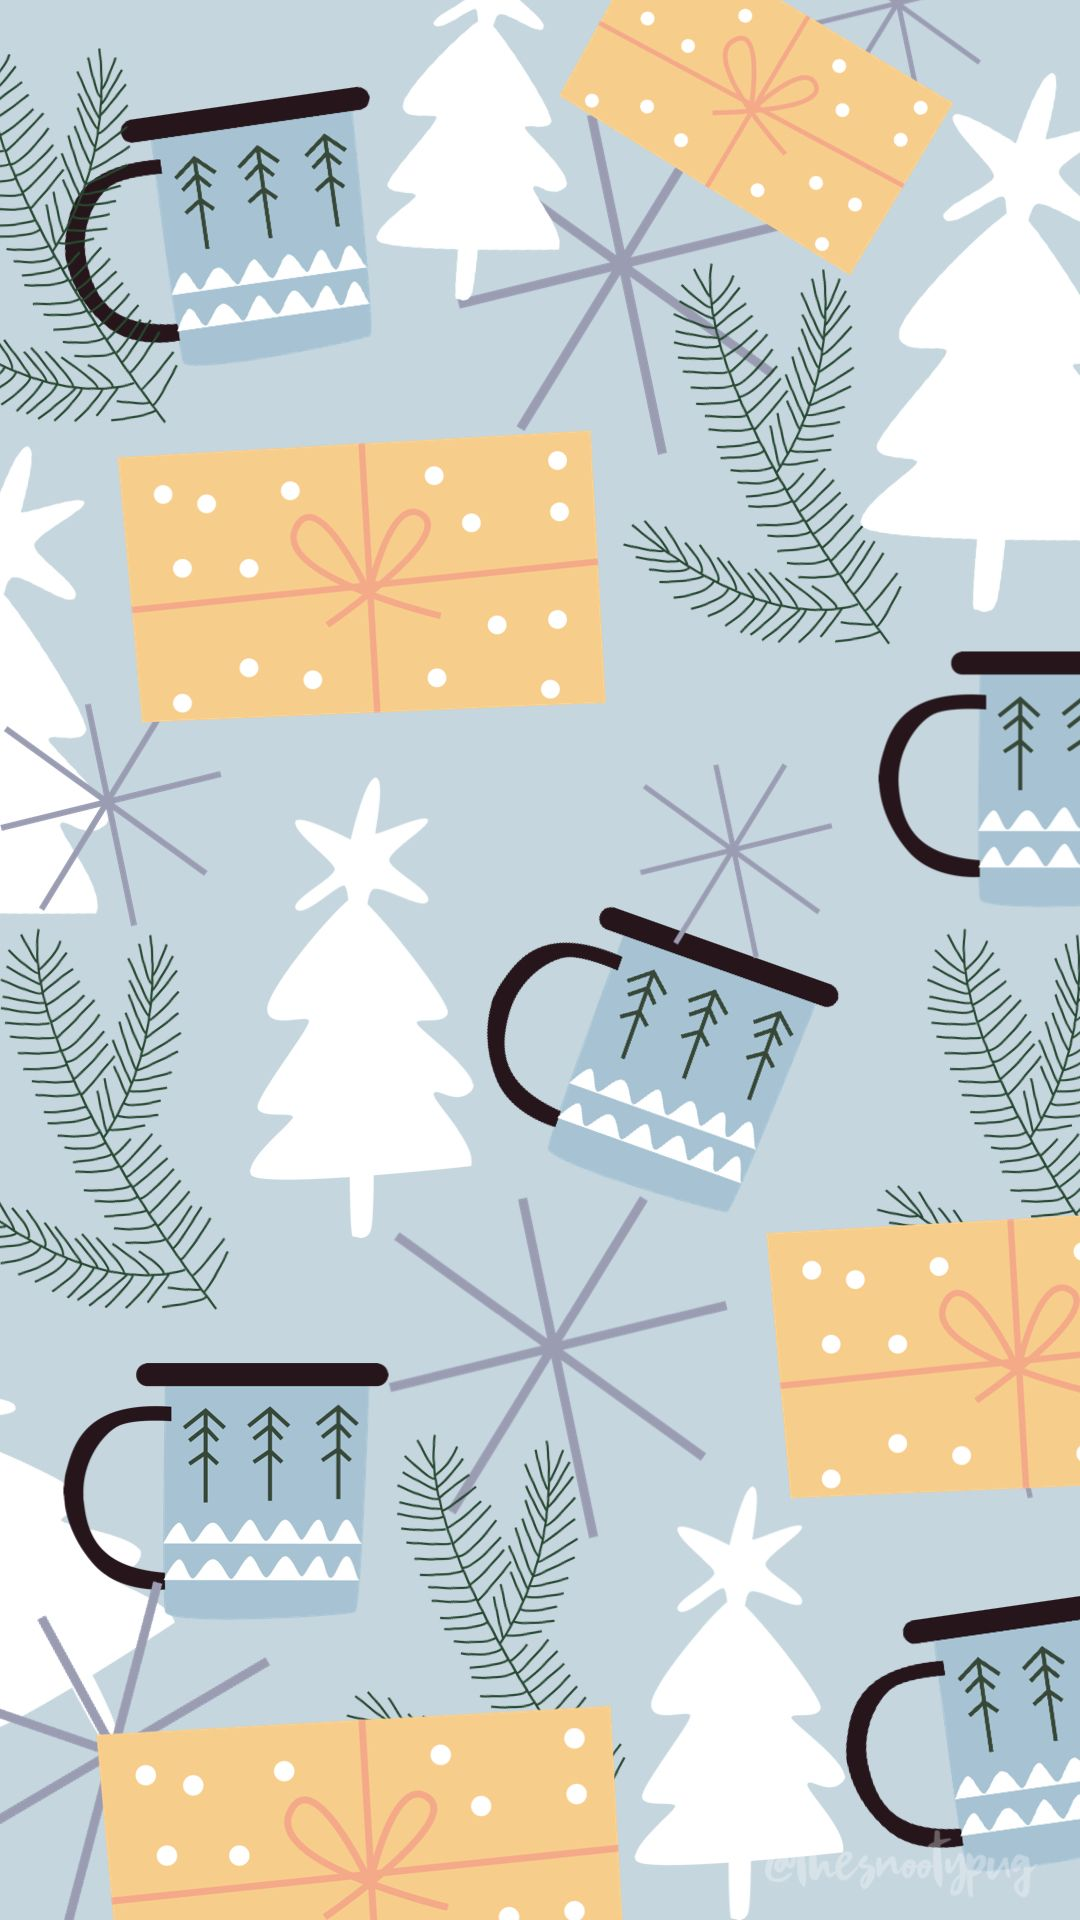 Modern Trendy Christmas Wallpaper Xmas Wallpaper Wallpaper Iphone Christmas Christmas Wallpaper